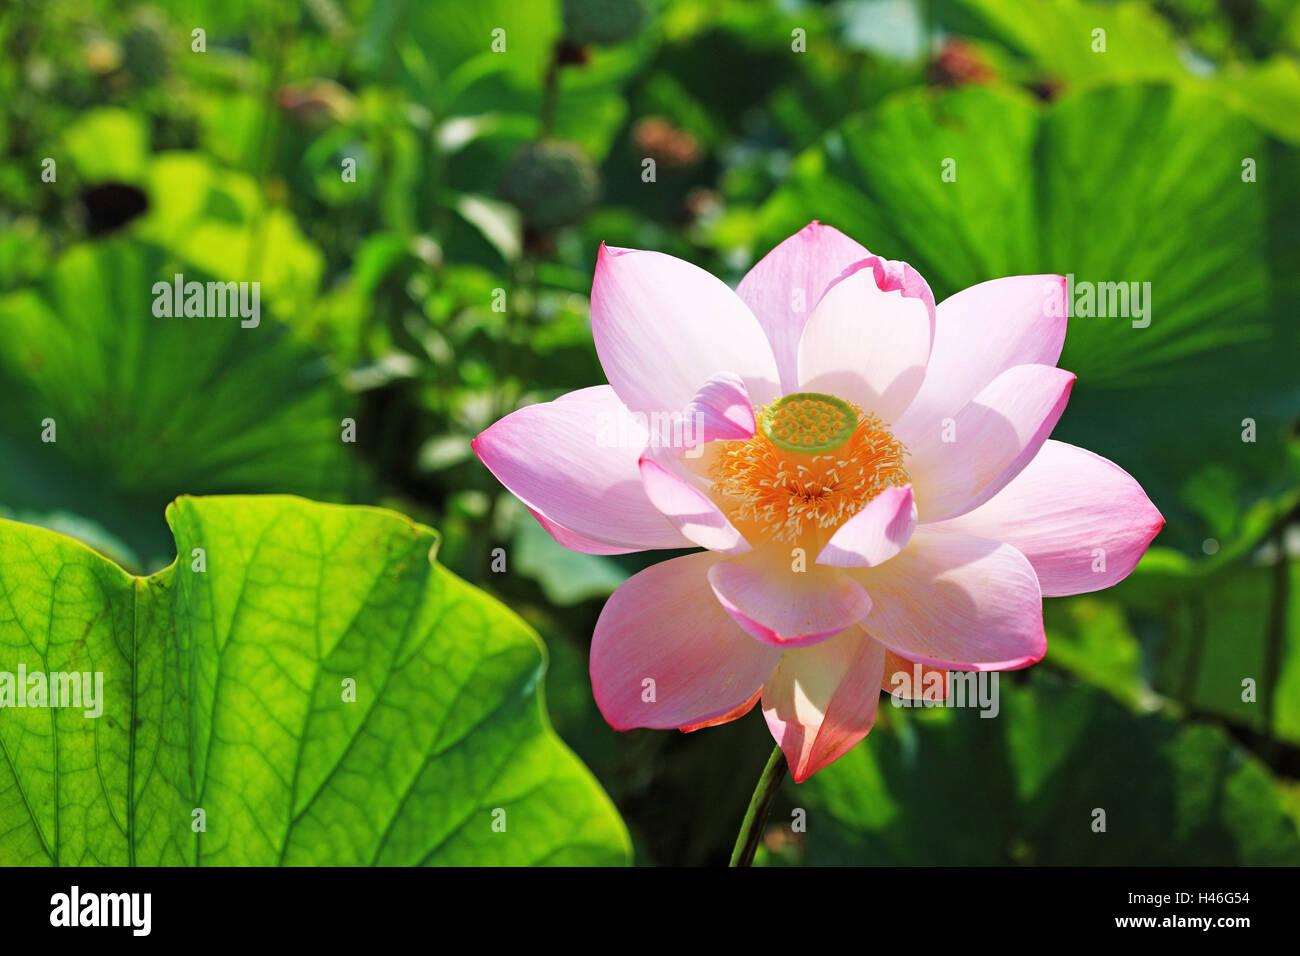 Lotus Flower Blossom Detail Flower Blossom Pink Delicate Pink